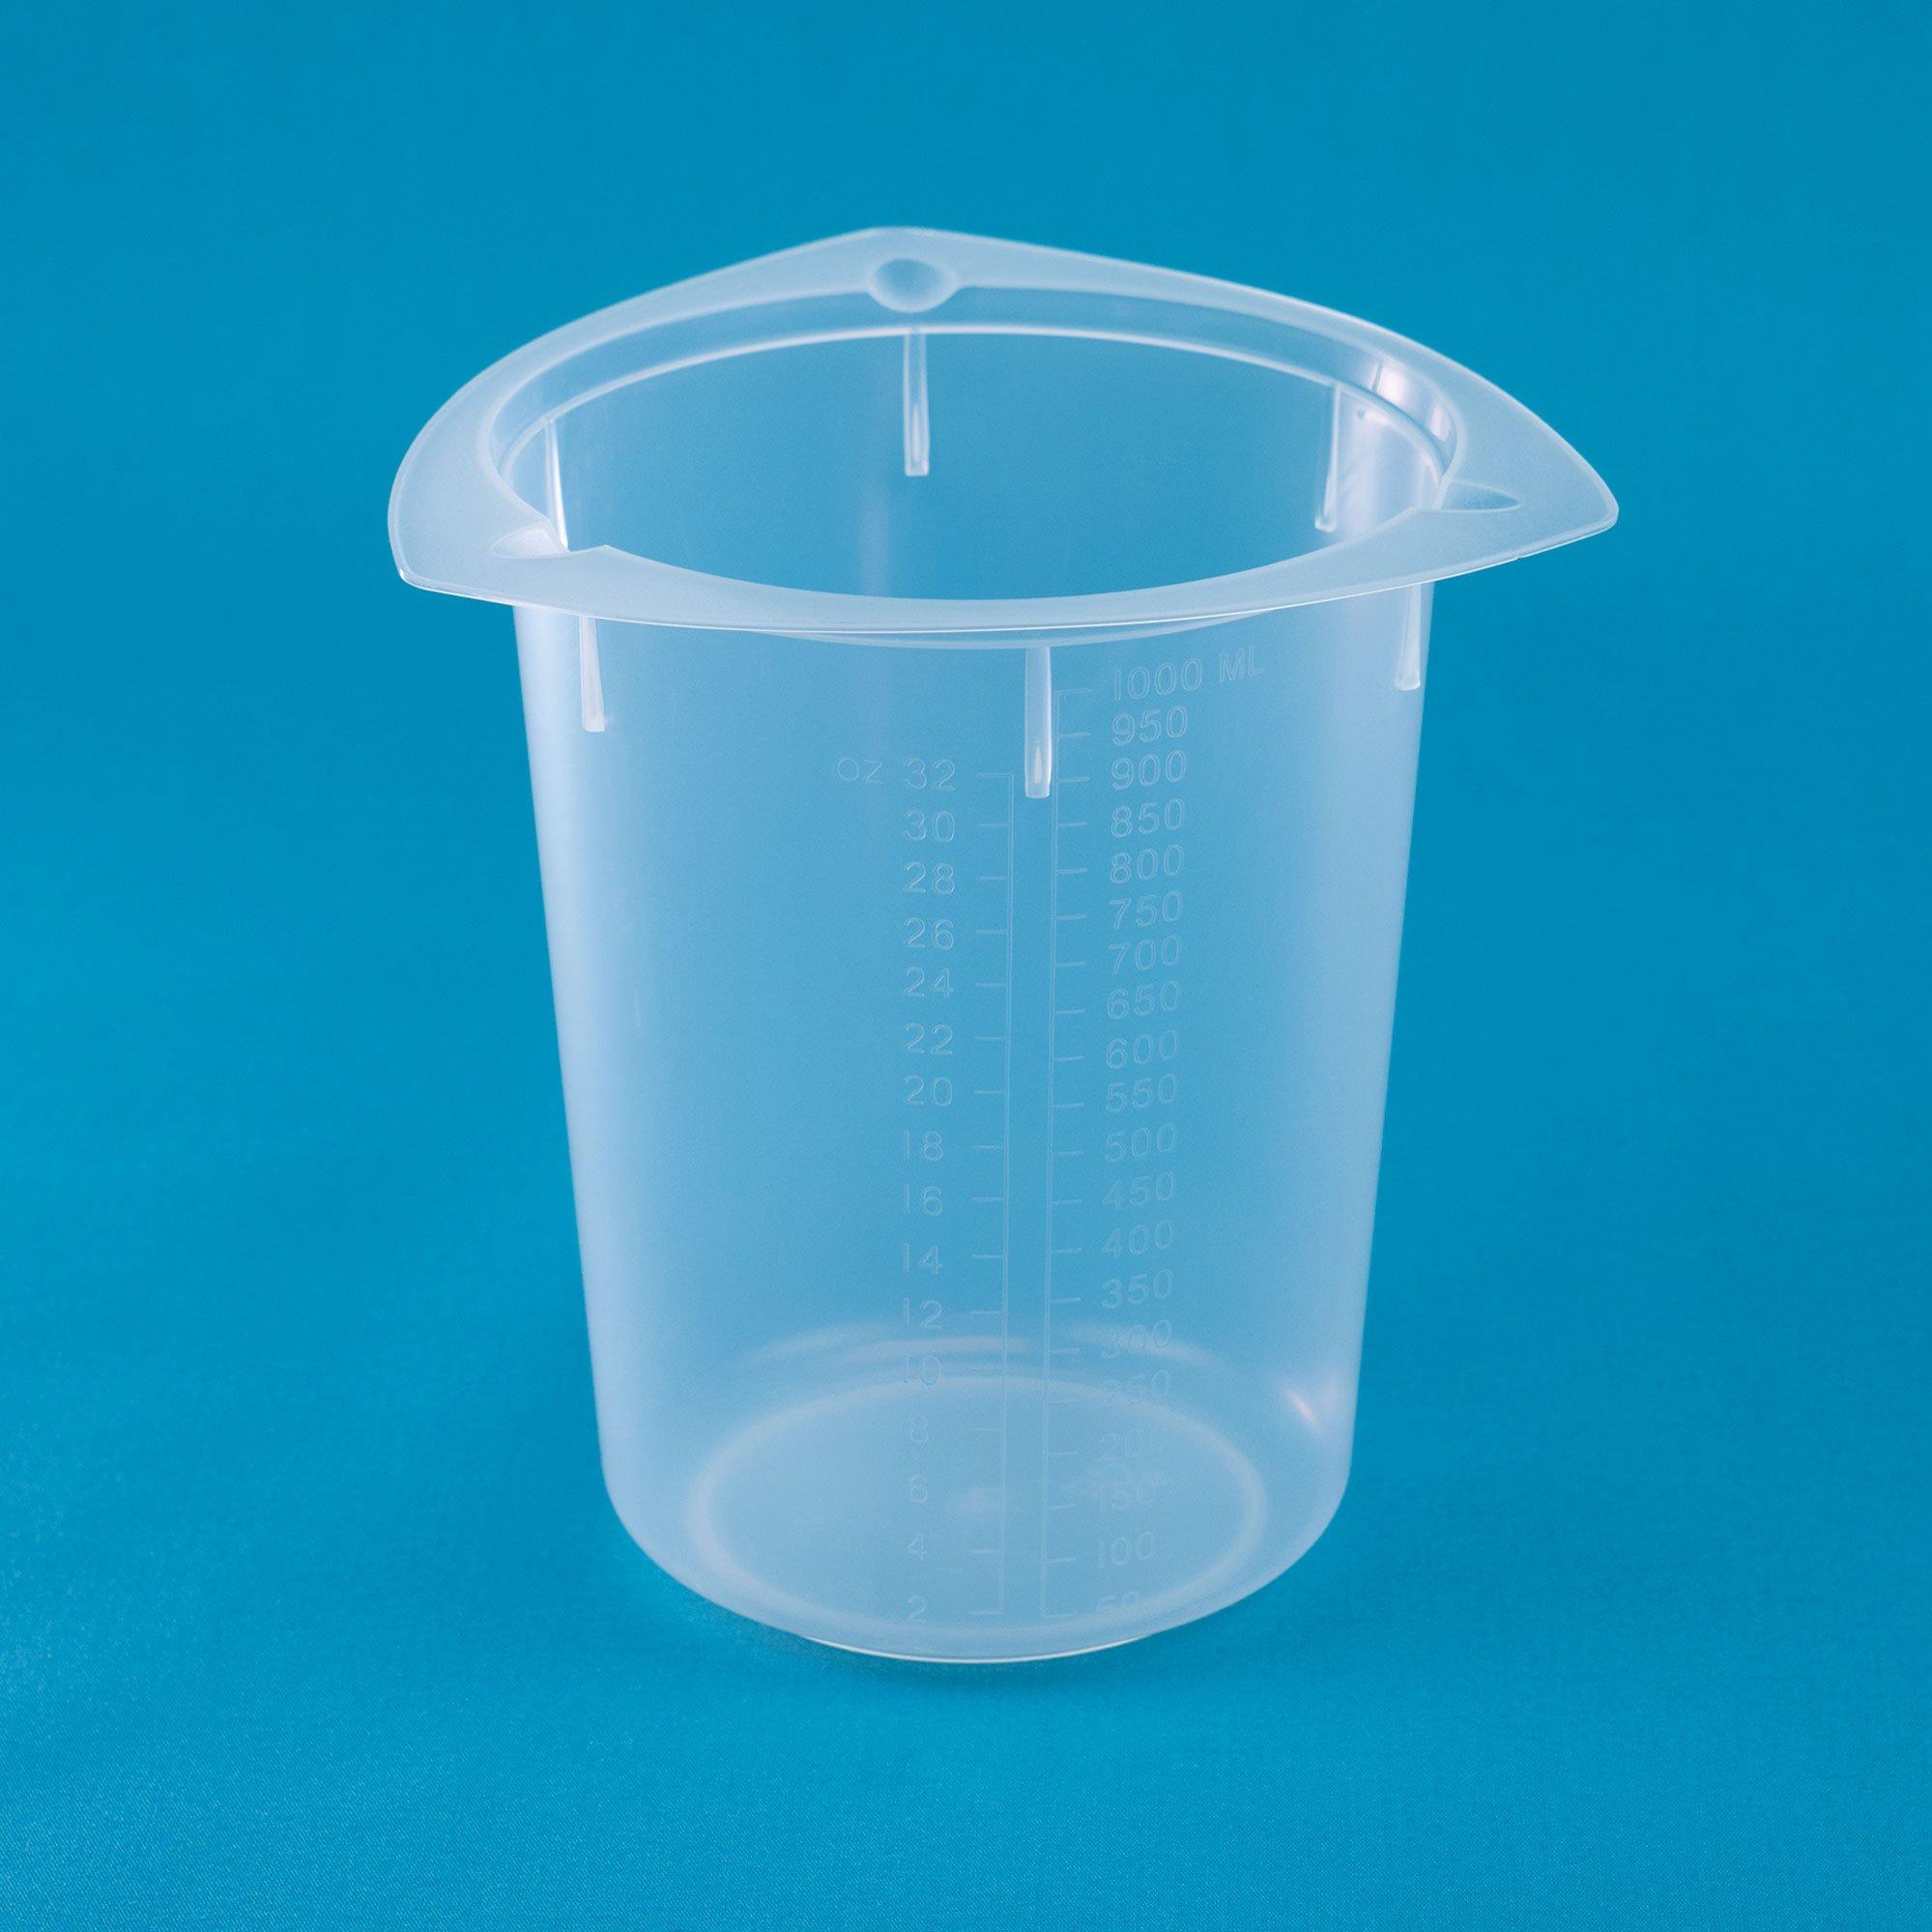 United Scientific BTC1000 Polypropylene Tri-Corner Beaker, 1000ml Capacity, 50ml Graduation Interval (Case of 100)